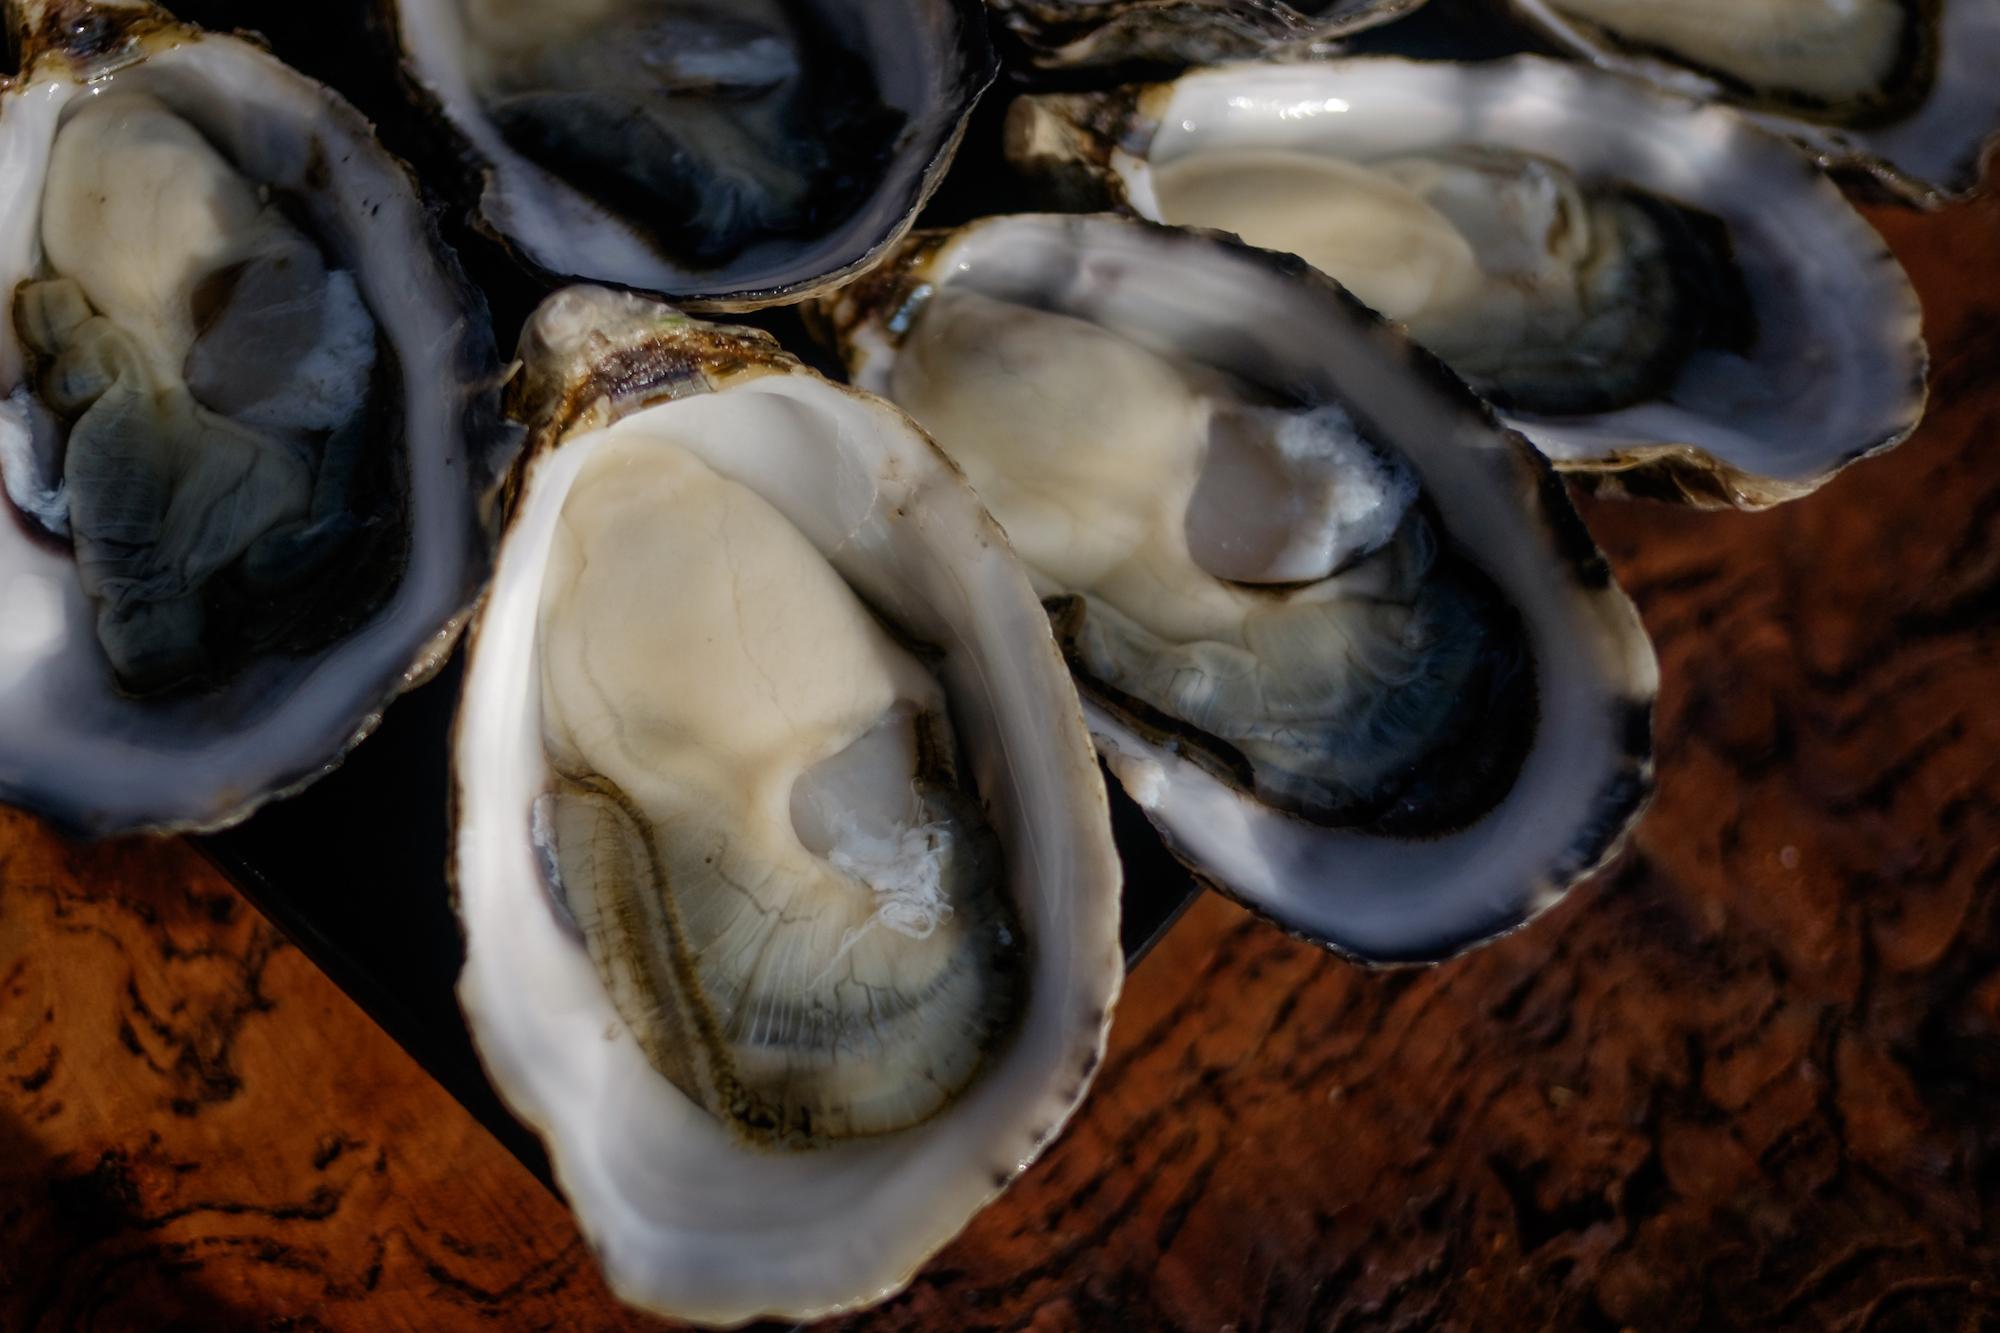 freycinet marine farm, oysters, east coast tasmania, great eastern drive